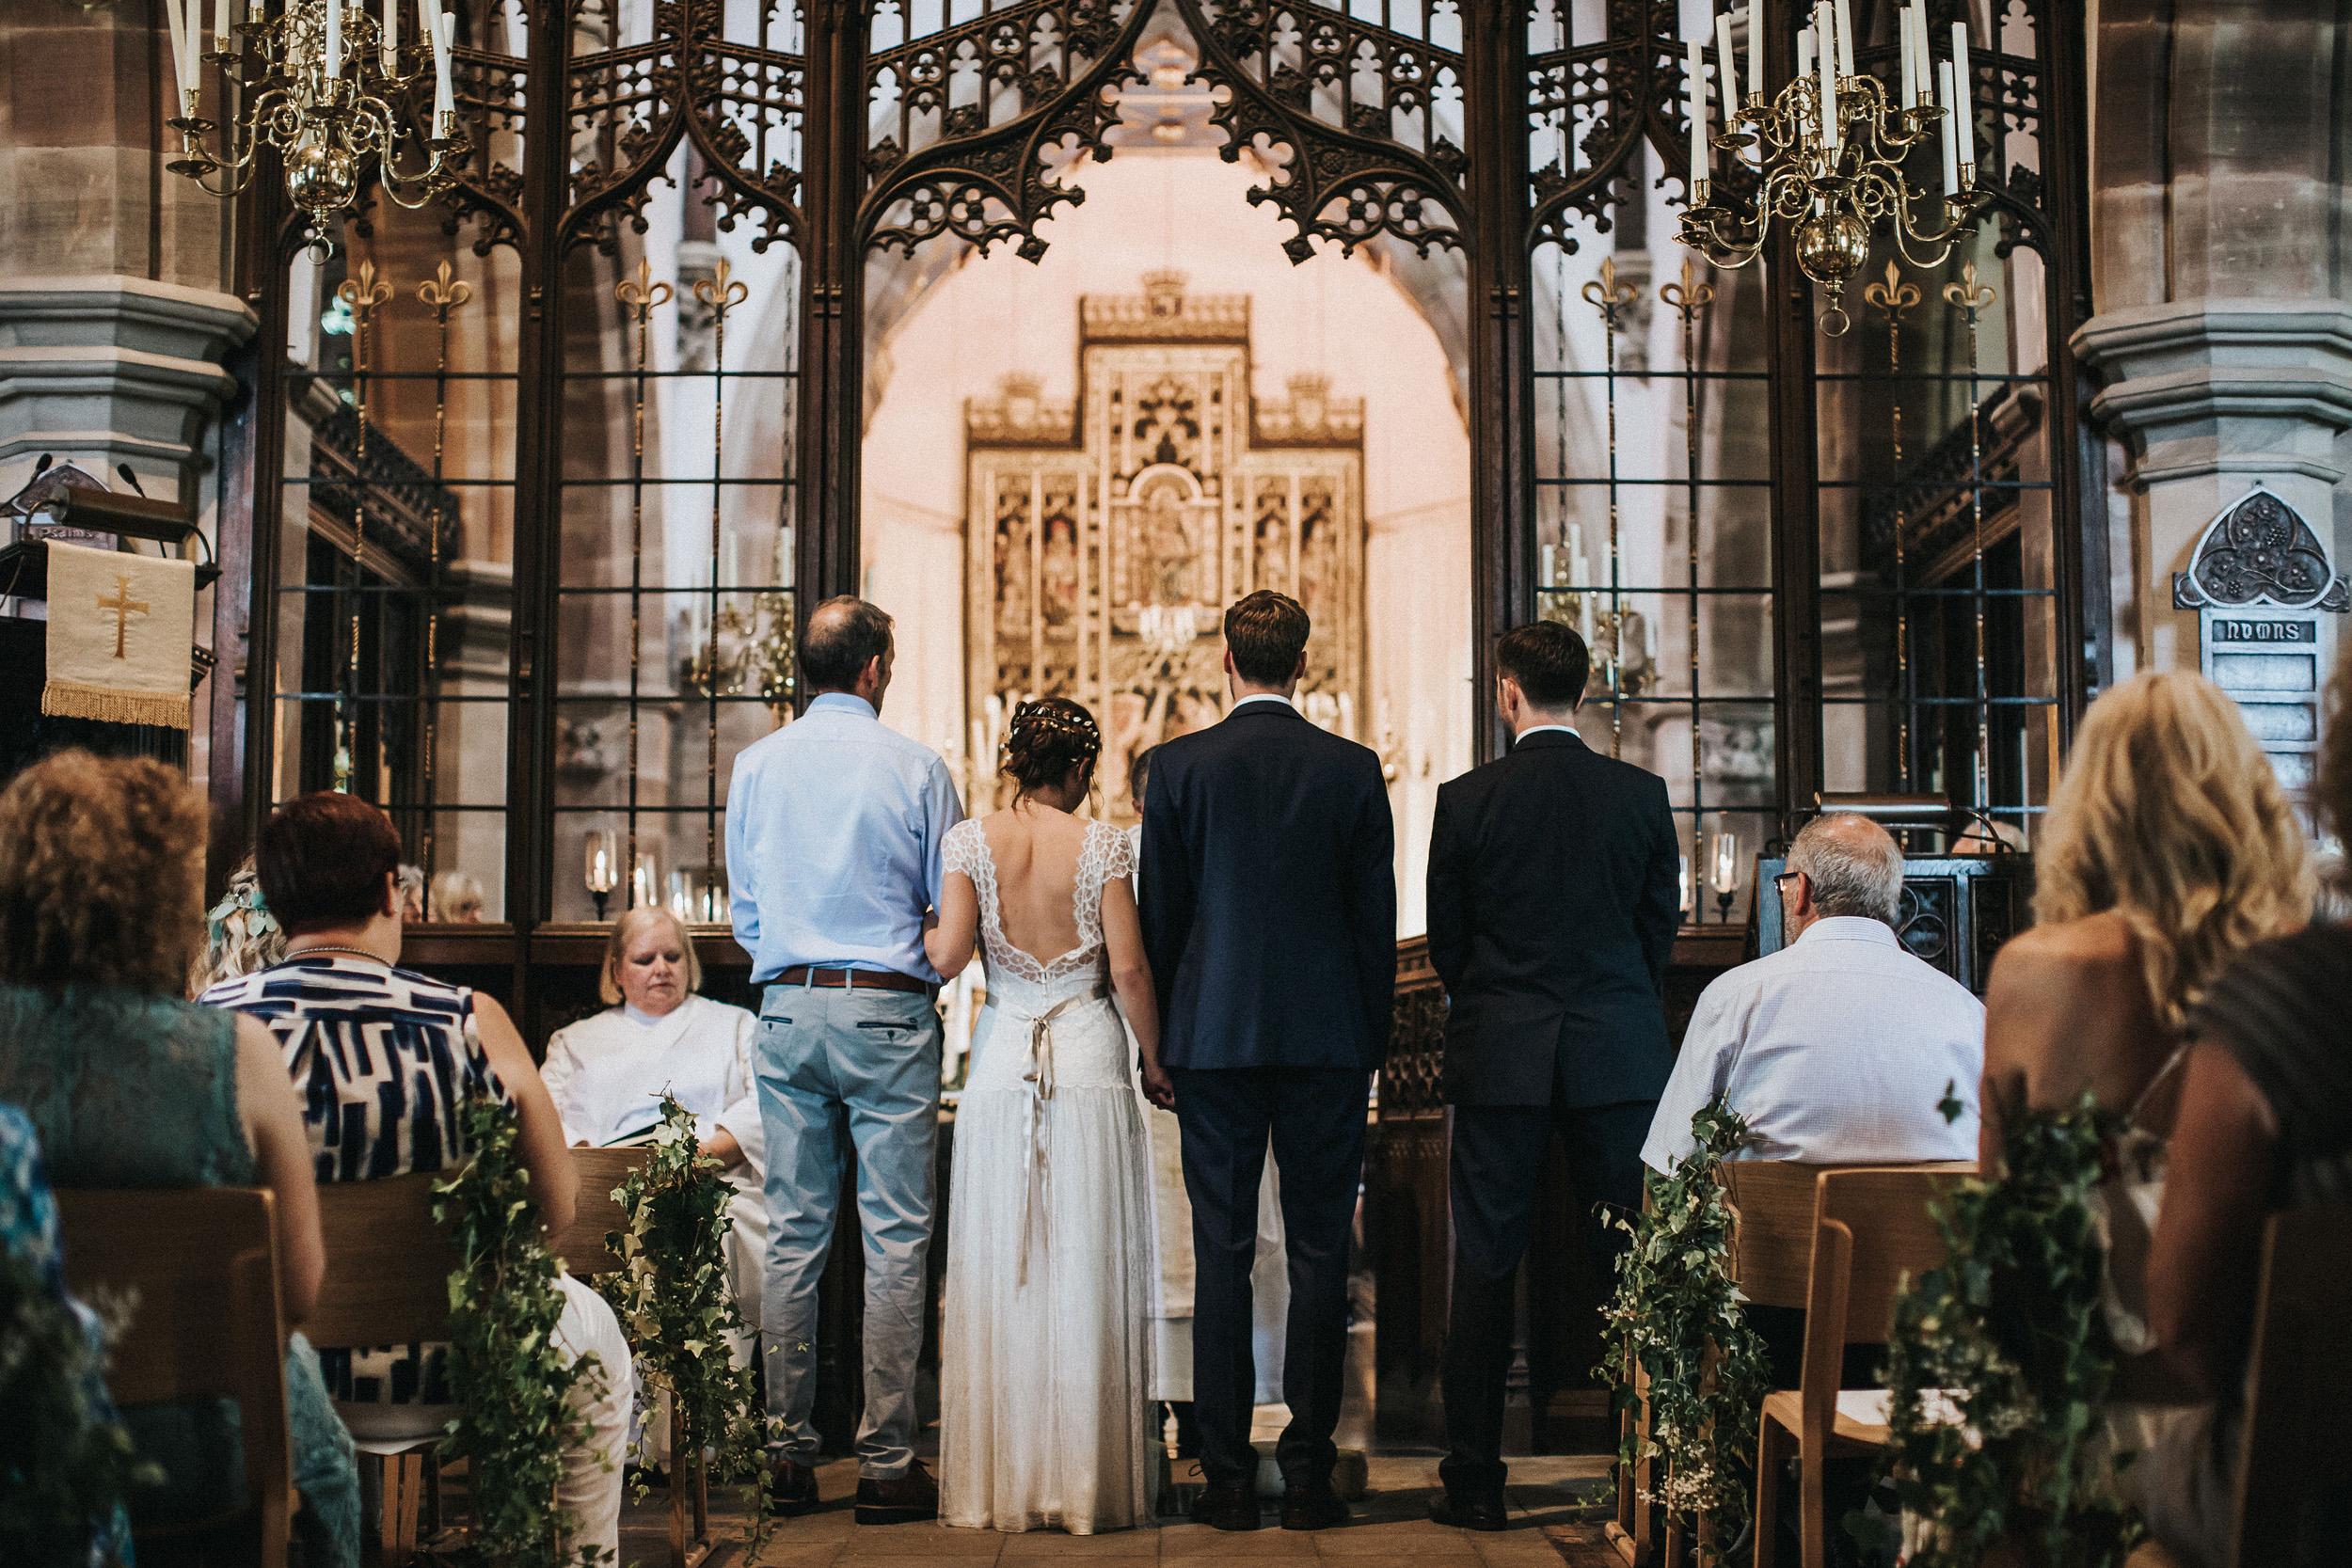 Martha-Laid-Back-Garden-Wedding-Lace-Wedding-Dress-Bohemian-Kate-Beaumont-14.jpg